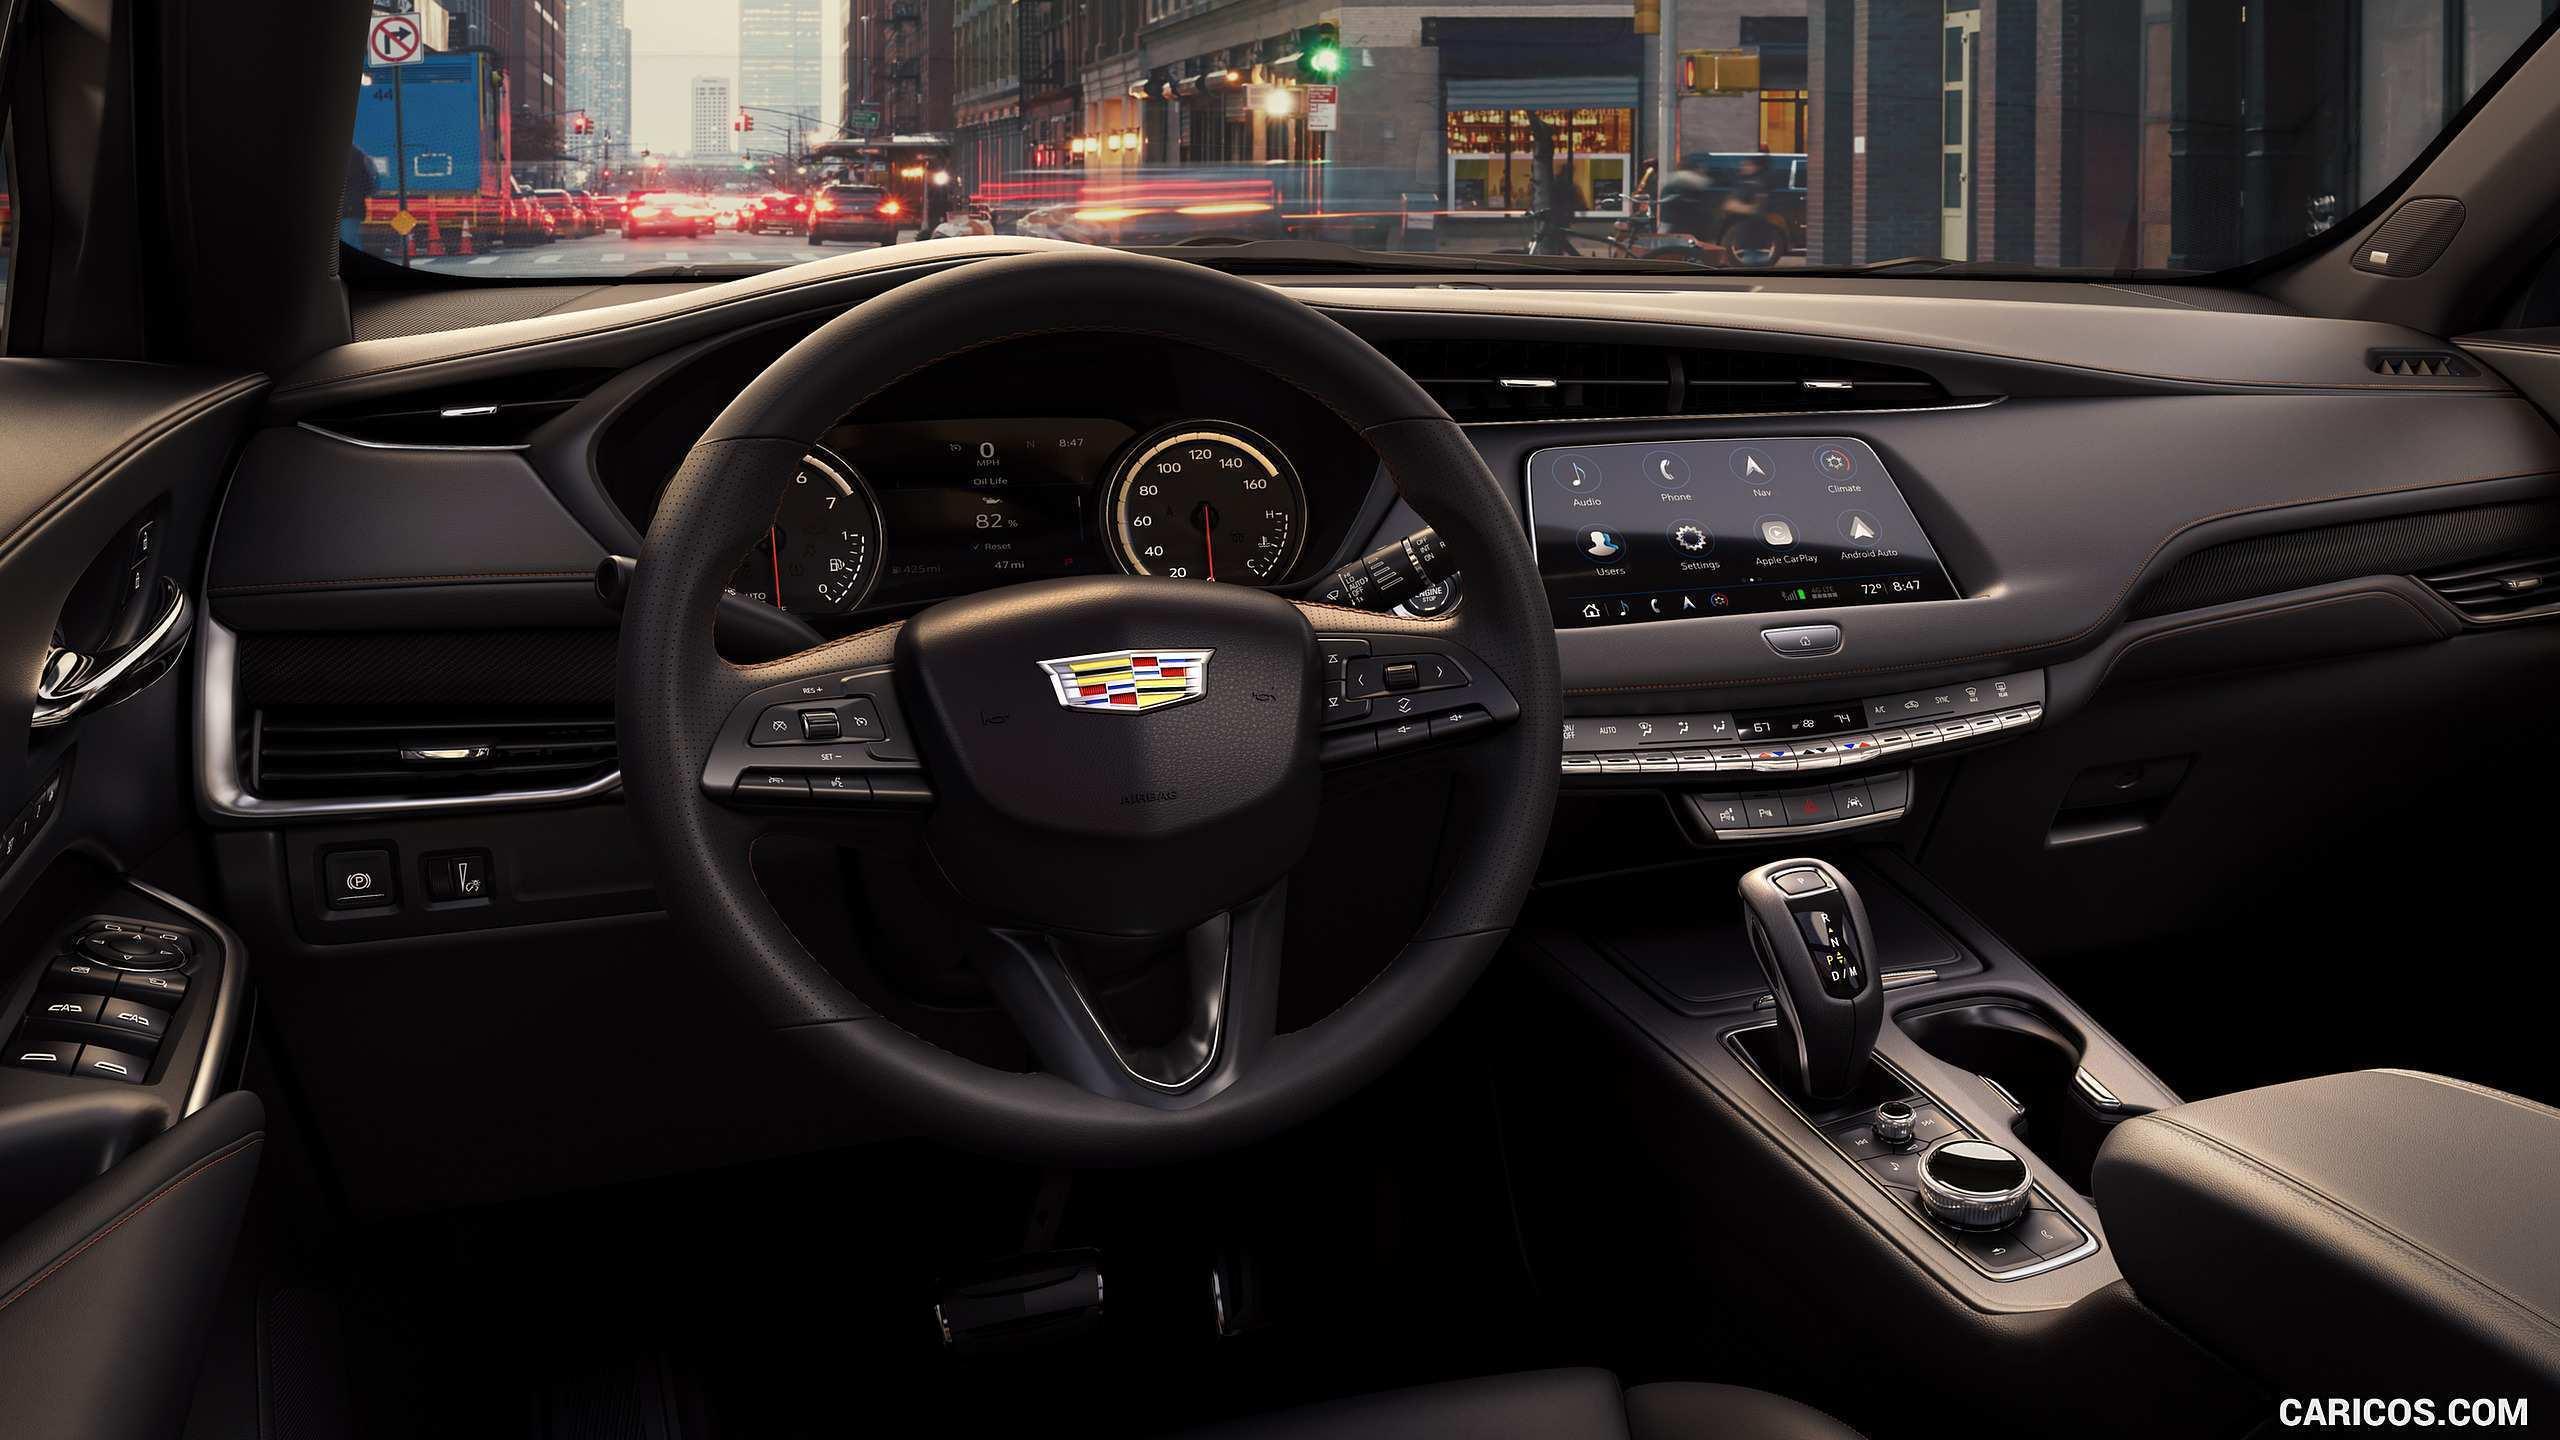 78 New 2019 Cadillac Interior Spesification by 2019 Cadillac Interior